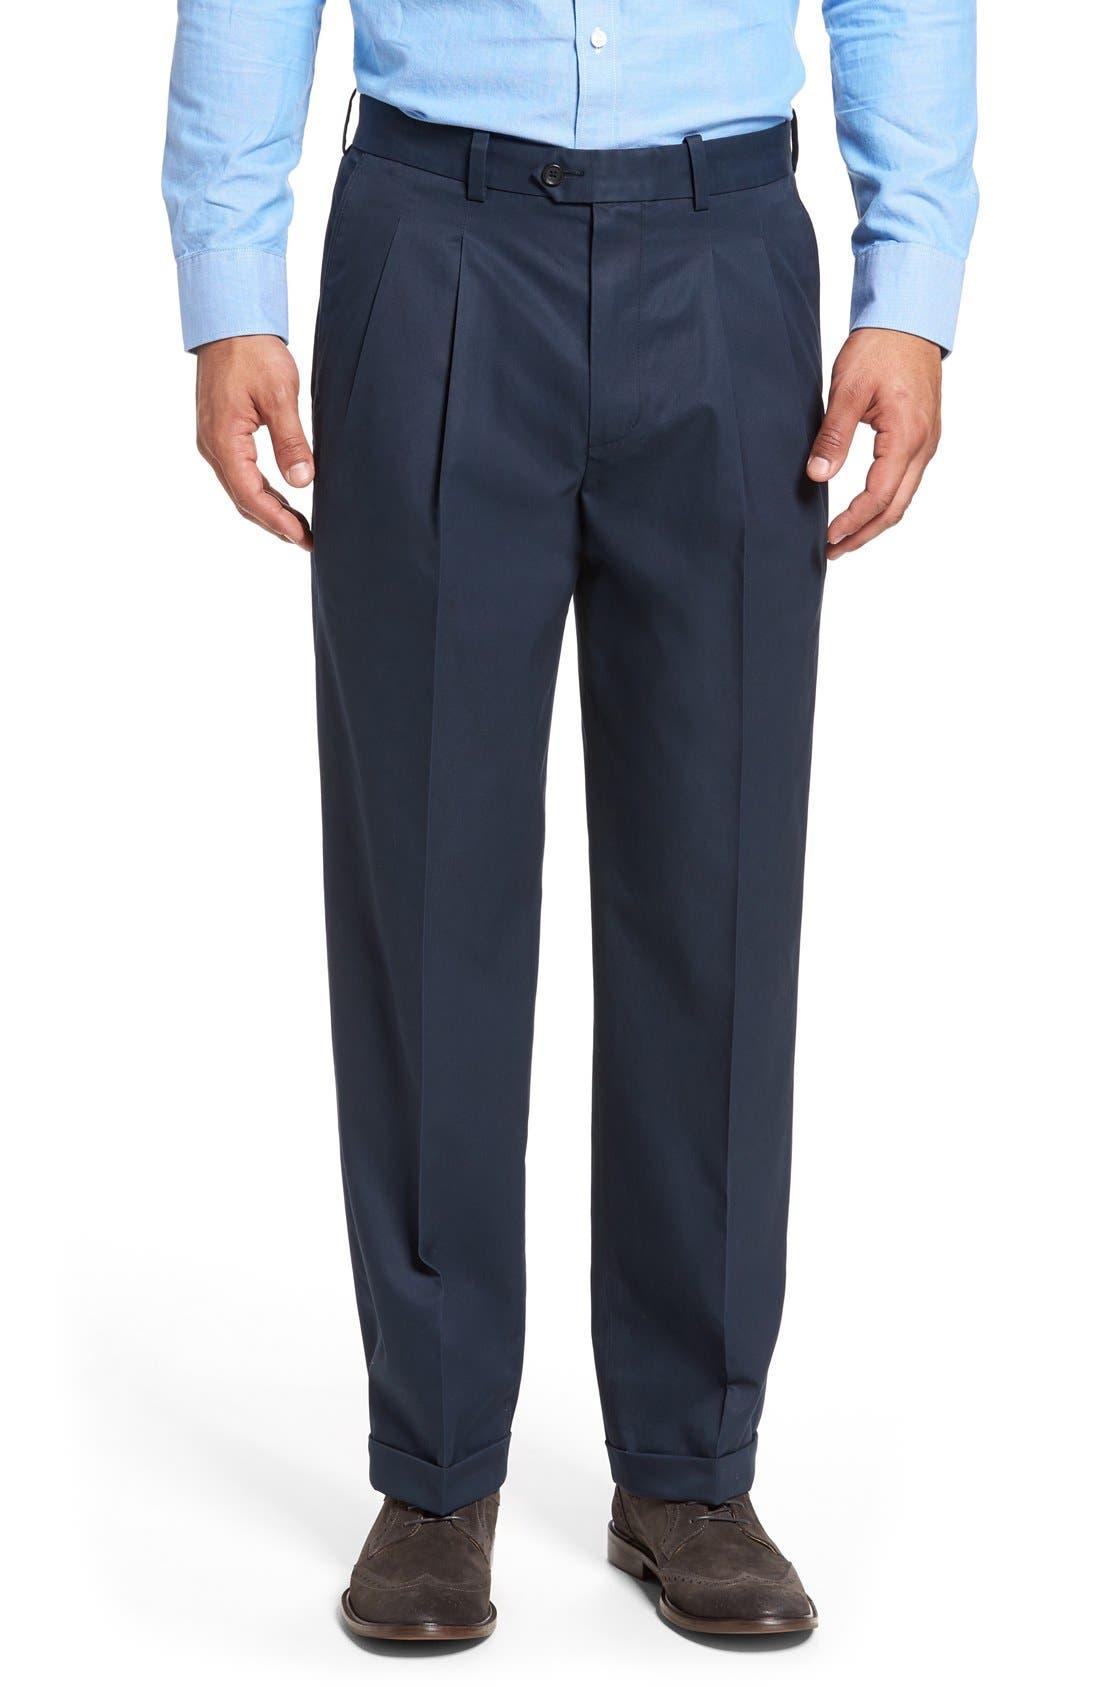 Nordstrom Men's Shop Classic Smartcare™ Supima® Cotton Pleated Trousers (Regular, Big & Tall)